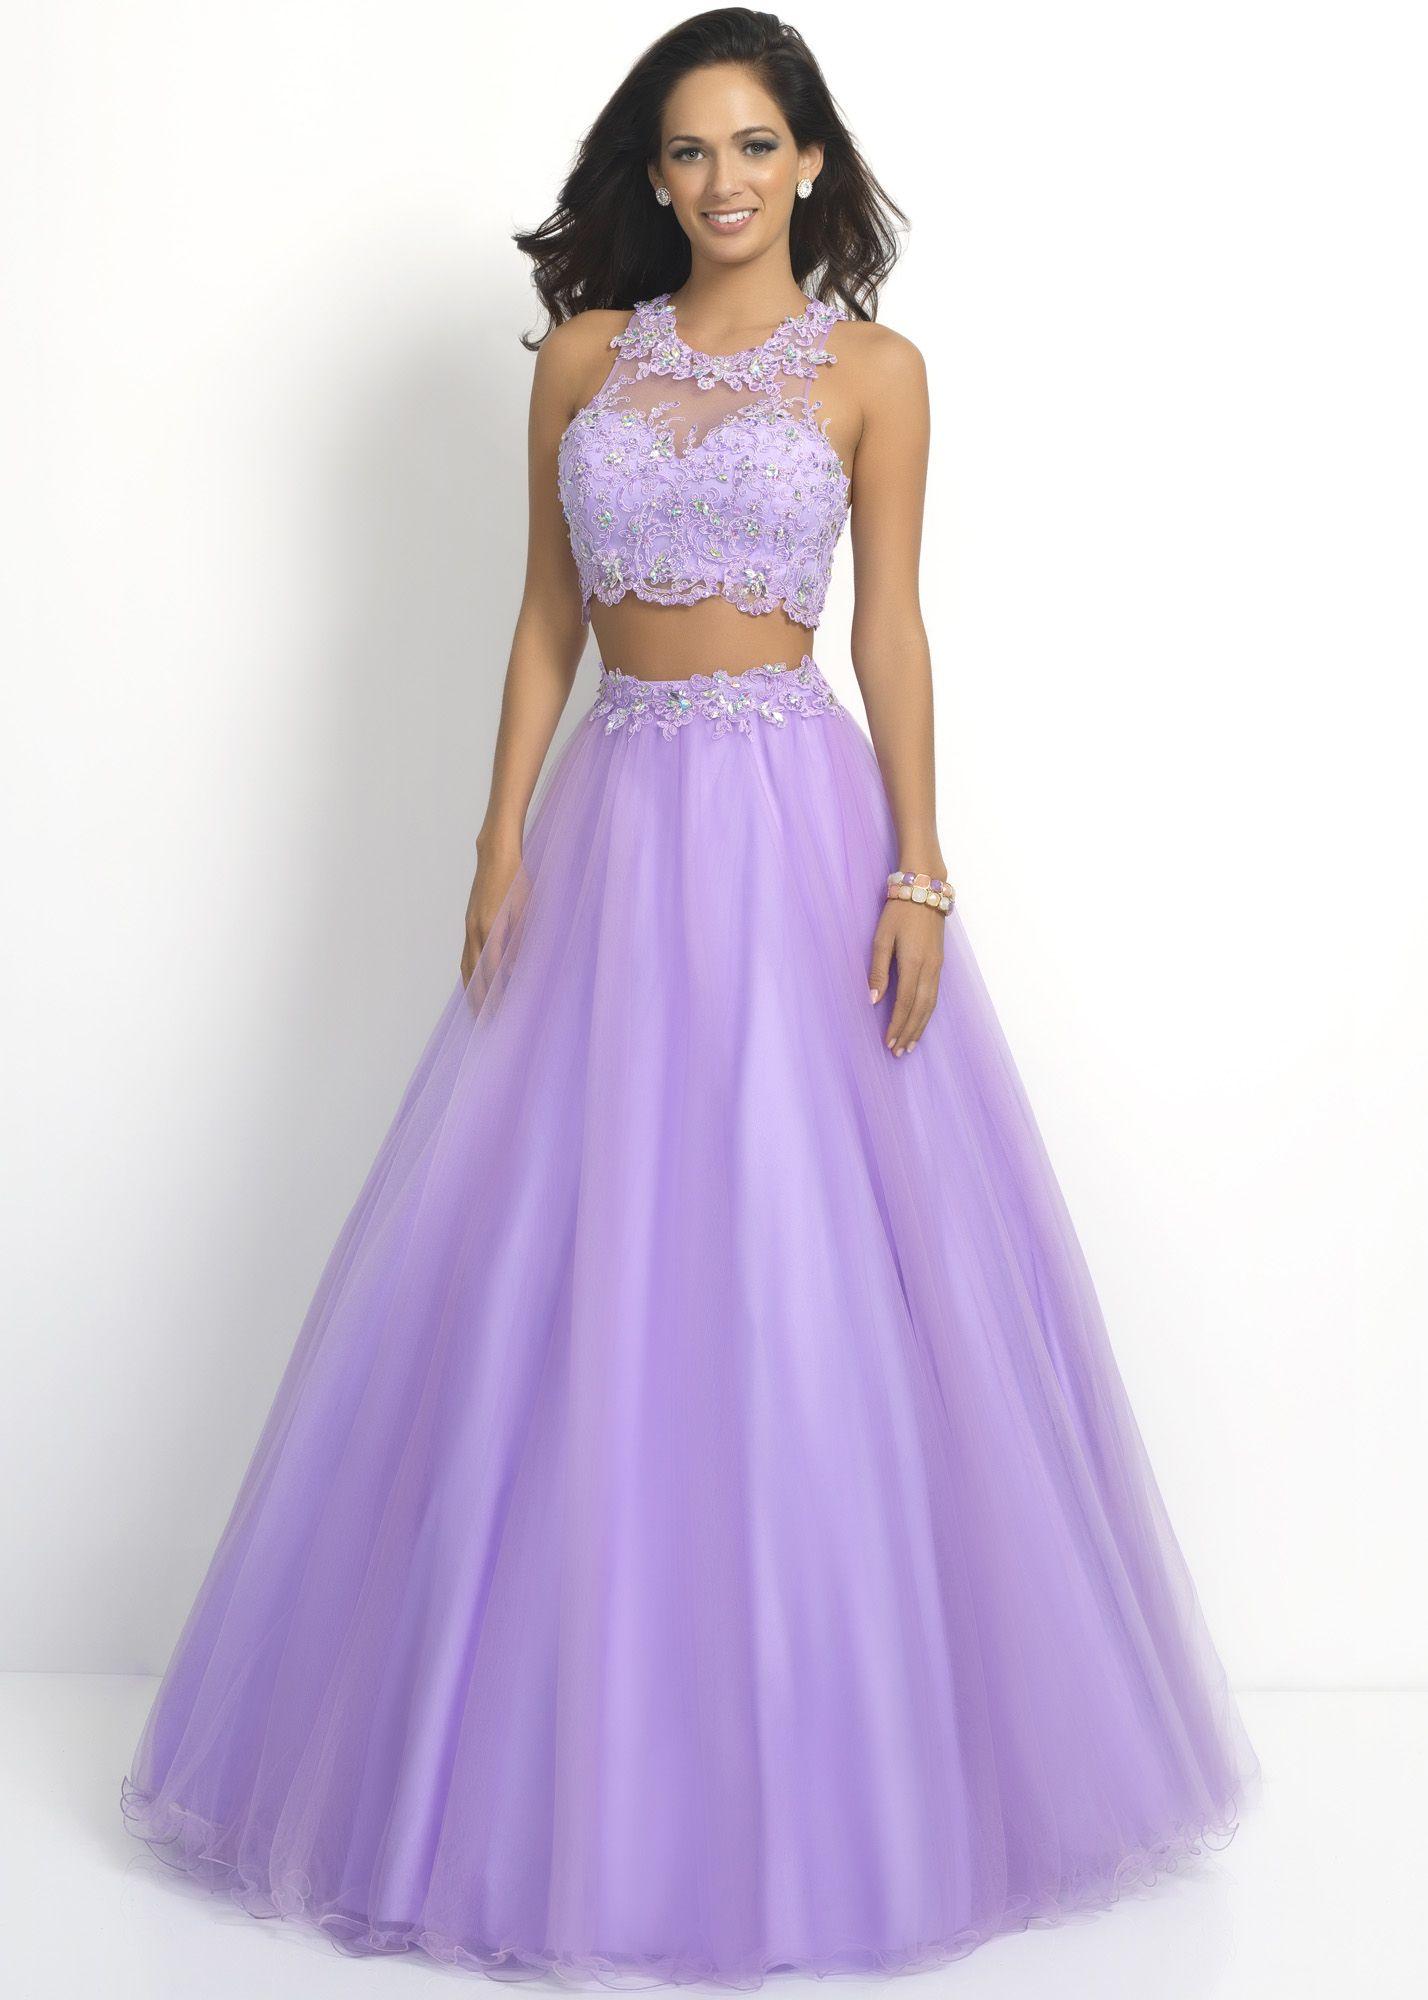 Blush 5430 Lace Two Piece Dress   MODA   Pinterest   Vestidos de ...